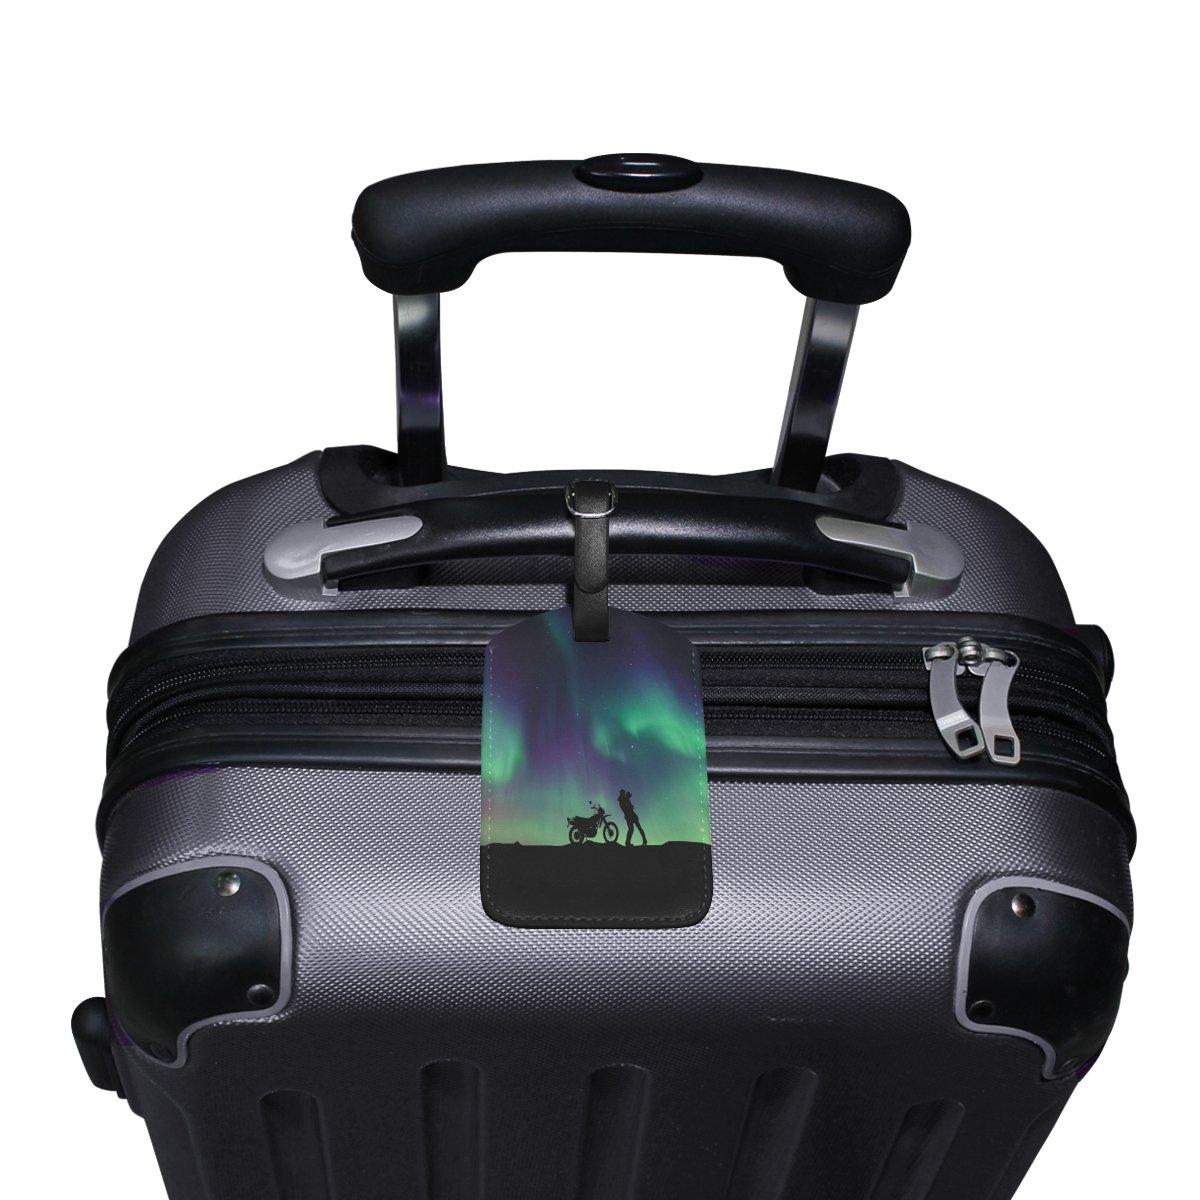 1Pcs Saobao Travel Luggage Tag Sky Aurora PU Leather Baggage Suitcase Travel ID Bag Tag